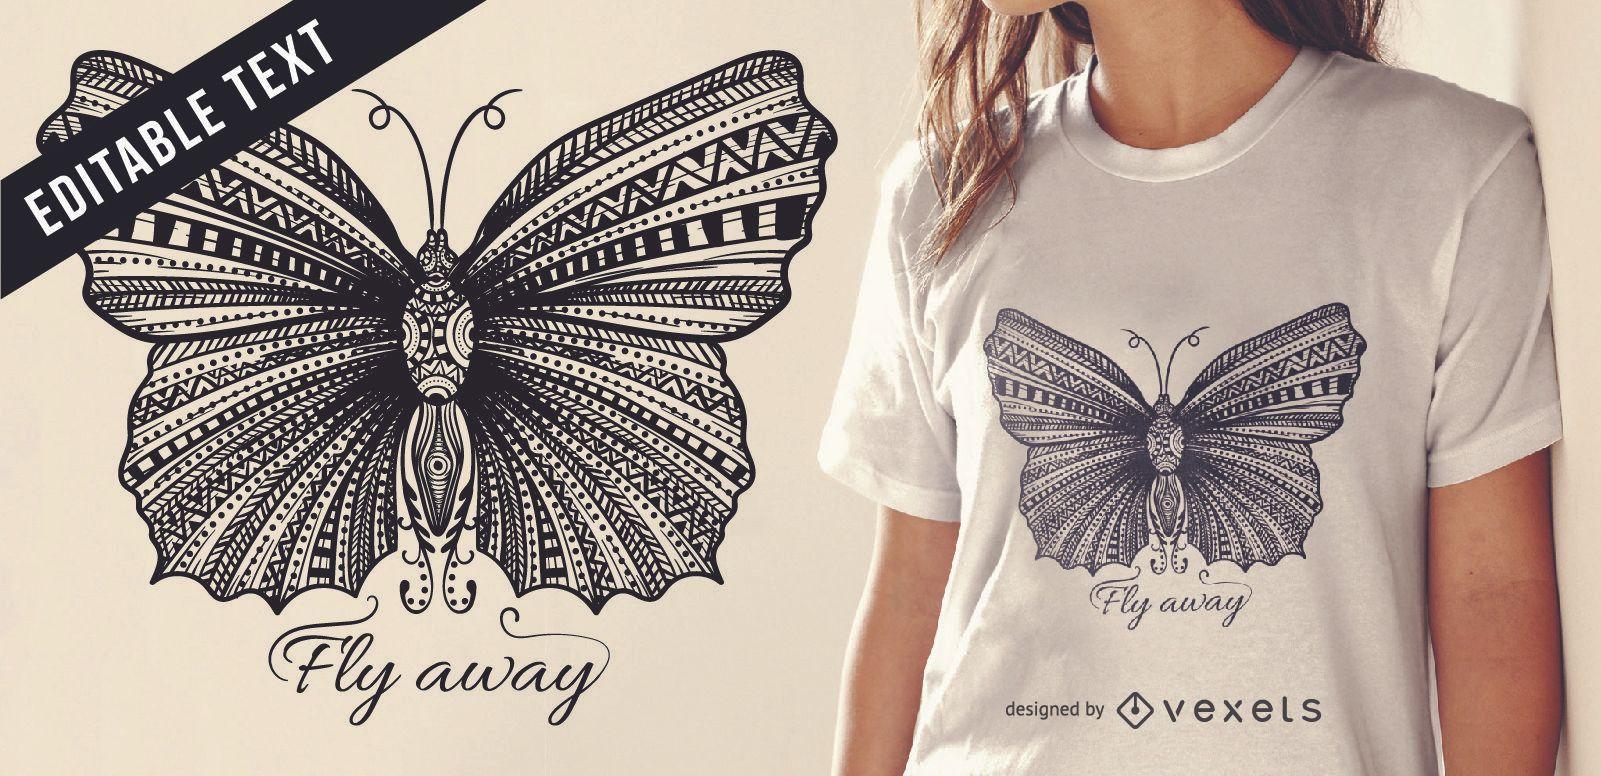 Dise?o de camiseta con ilustraci?n de mariposa